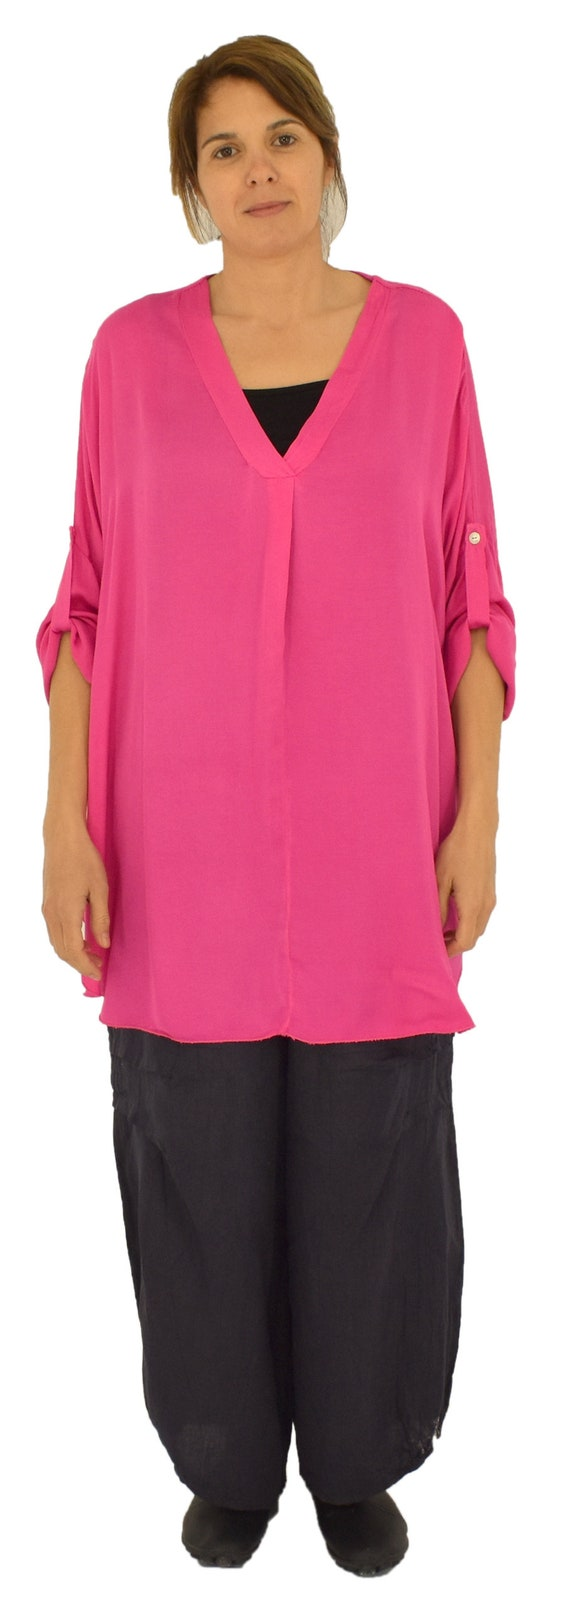 ba267e8bf52a1 Large size blouse LB300PK Women s tunic oversize Plus Size